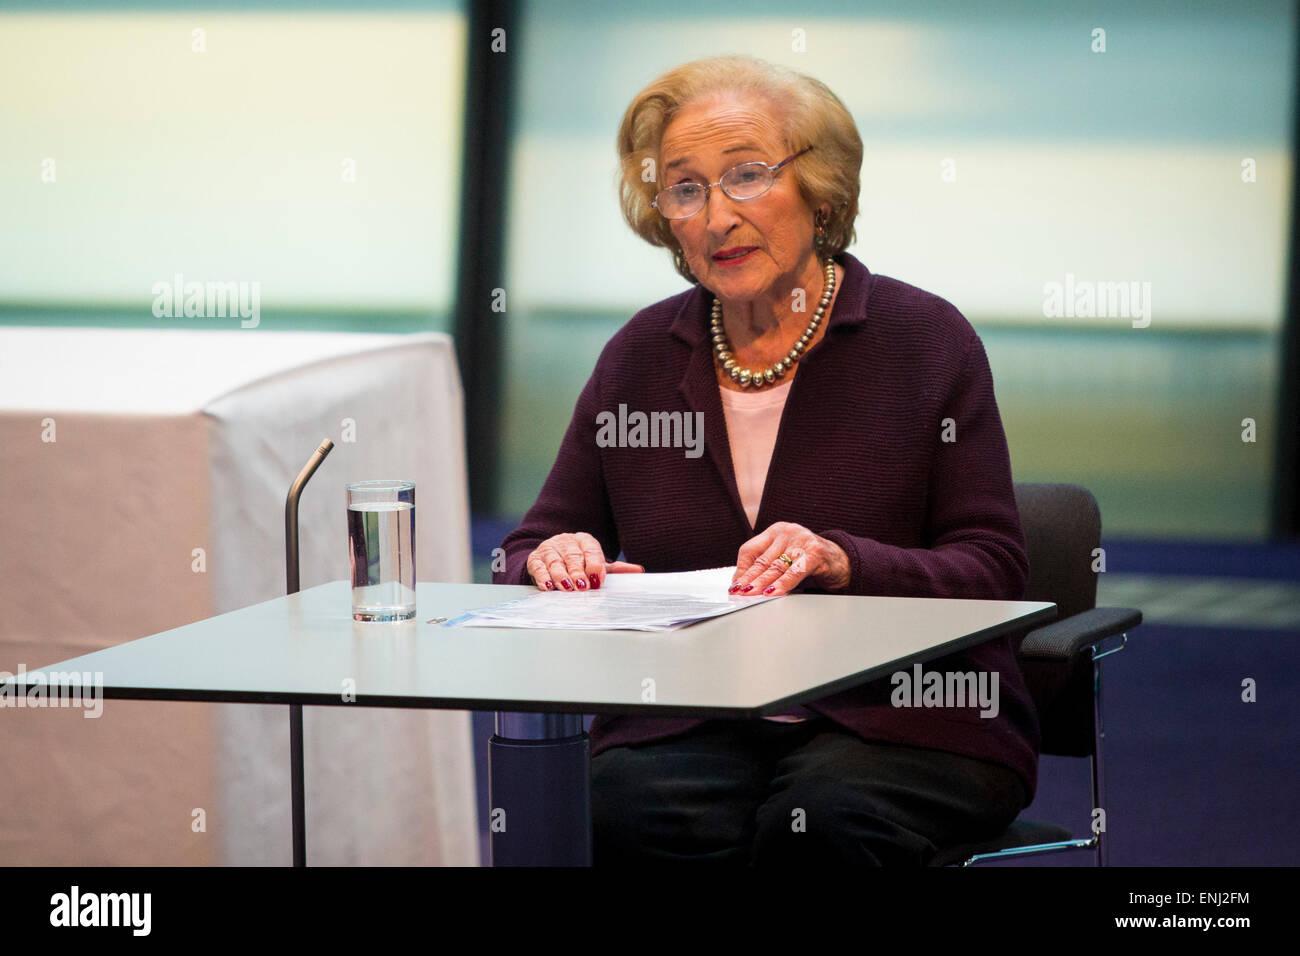 UNITED KINGDOM, London : Holocaust survivor Freda Wineman speaks at City Hall today for the annual Holocaust Memorial - Stock Image